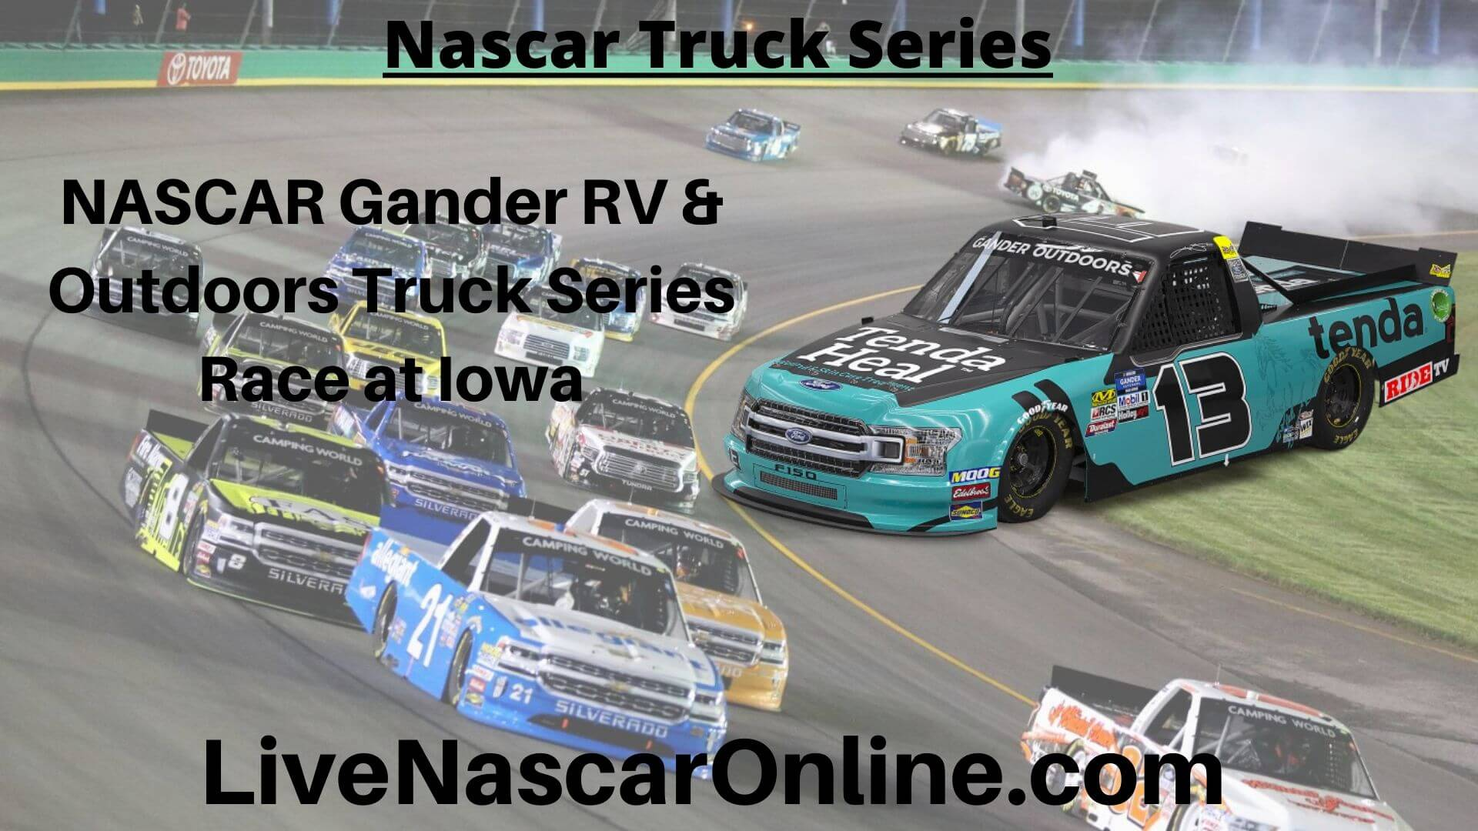 NASCAR Gander RV Online Stream | NASCAR Iowa 2020